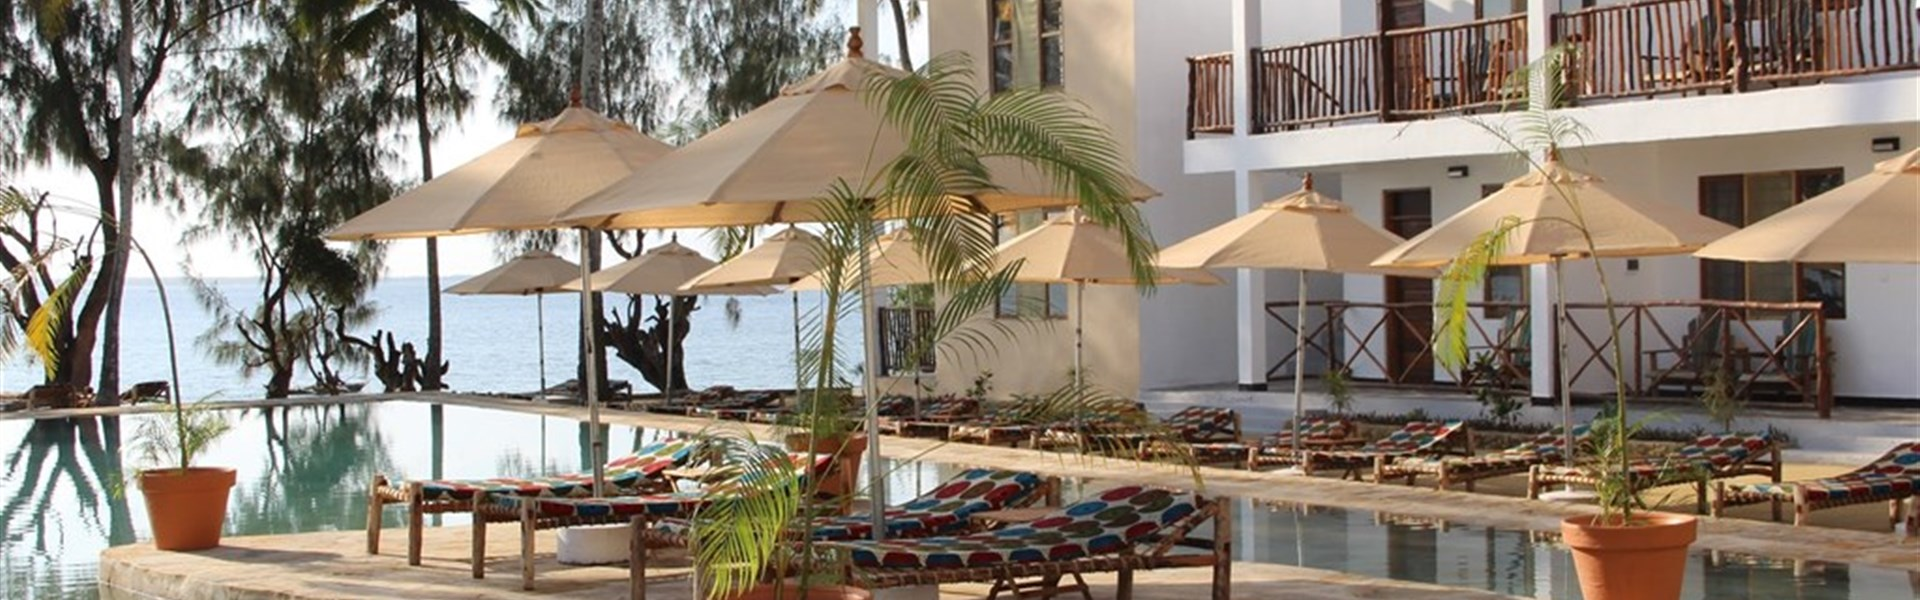 Zanzibar Bay Resort (4*) - All inclusive -